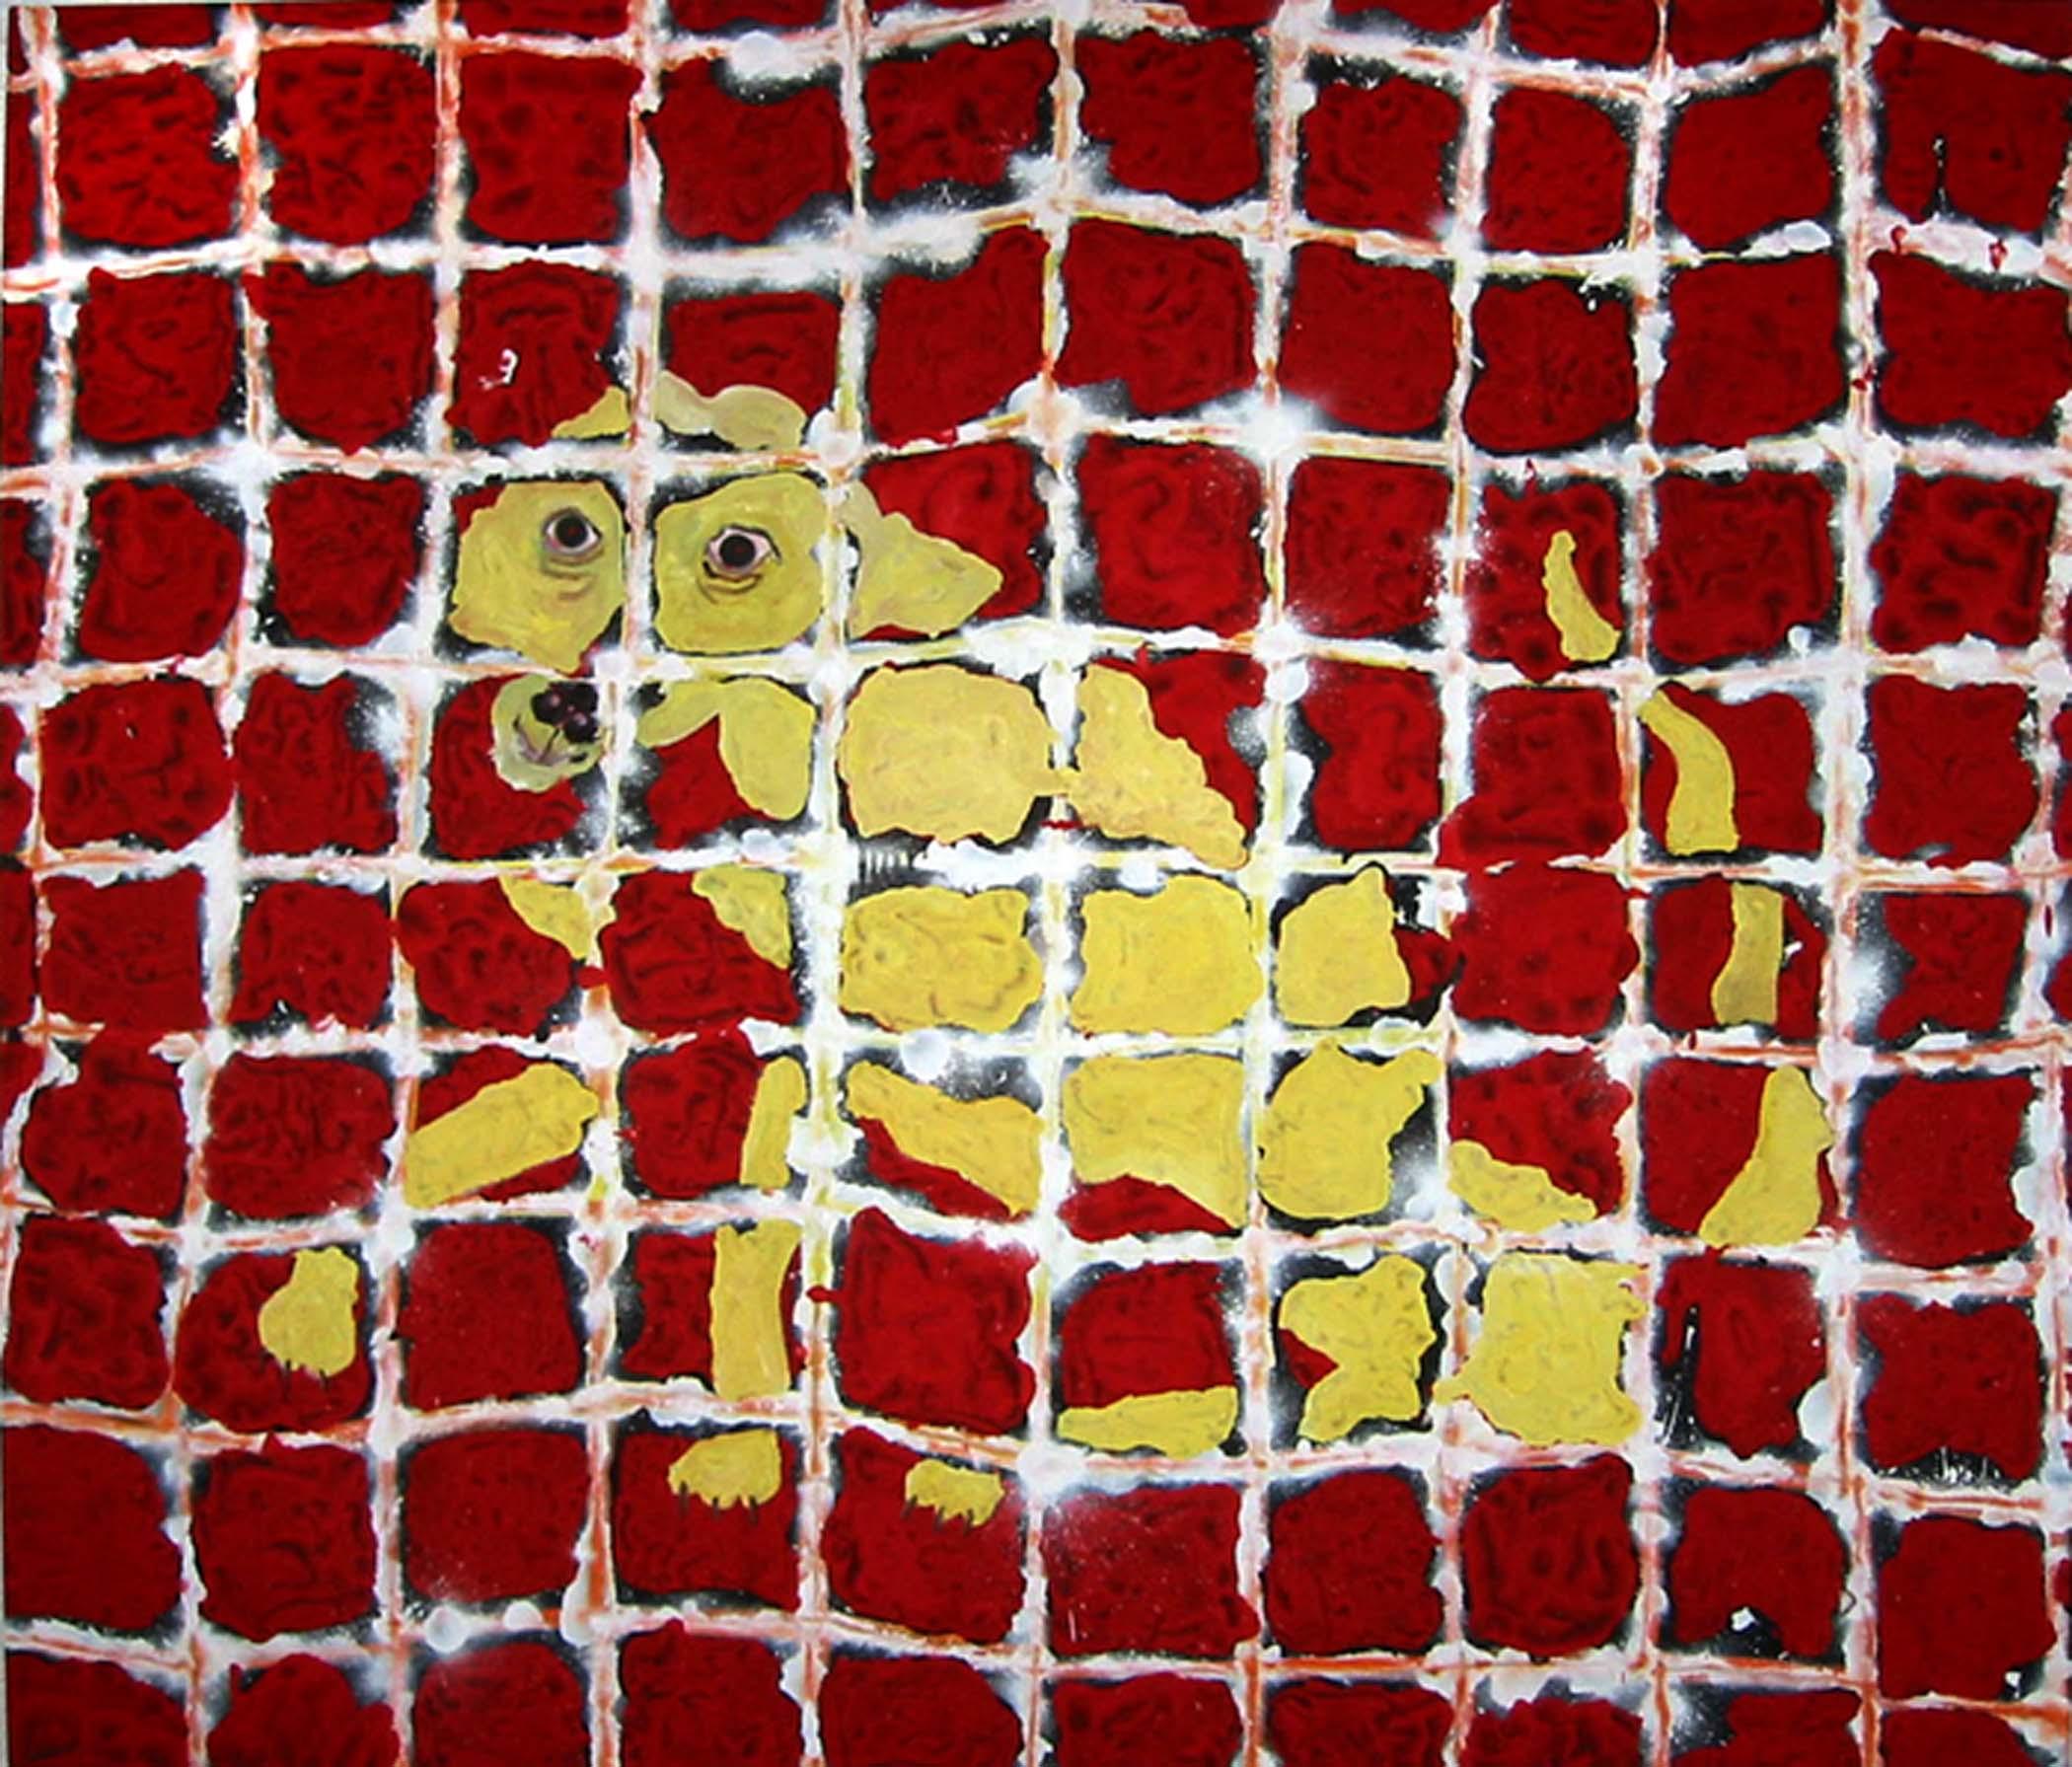 "Chien jaune sur rouge / Yellow dog on red,  2002, huile sur toile / oil on canvas, 56""x 48"", 90 x 122 cm."